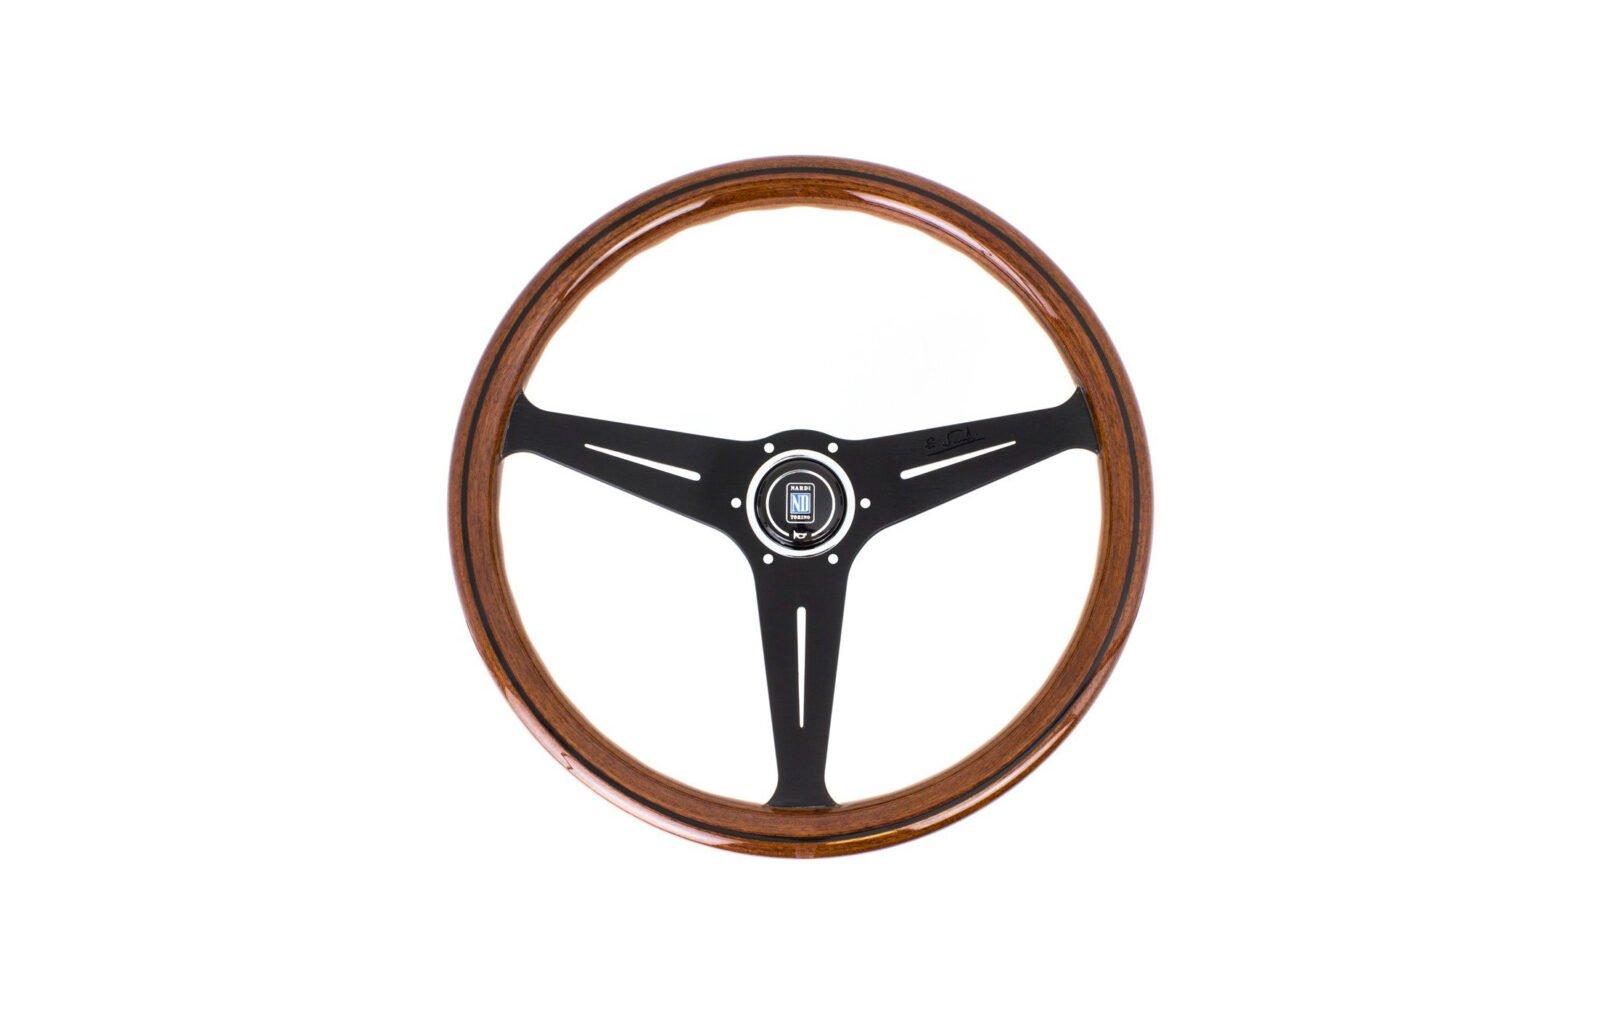 Nardi Classic Steering Wheel